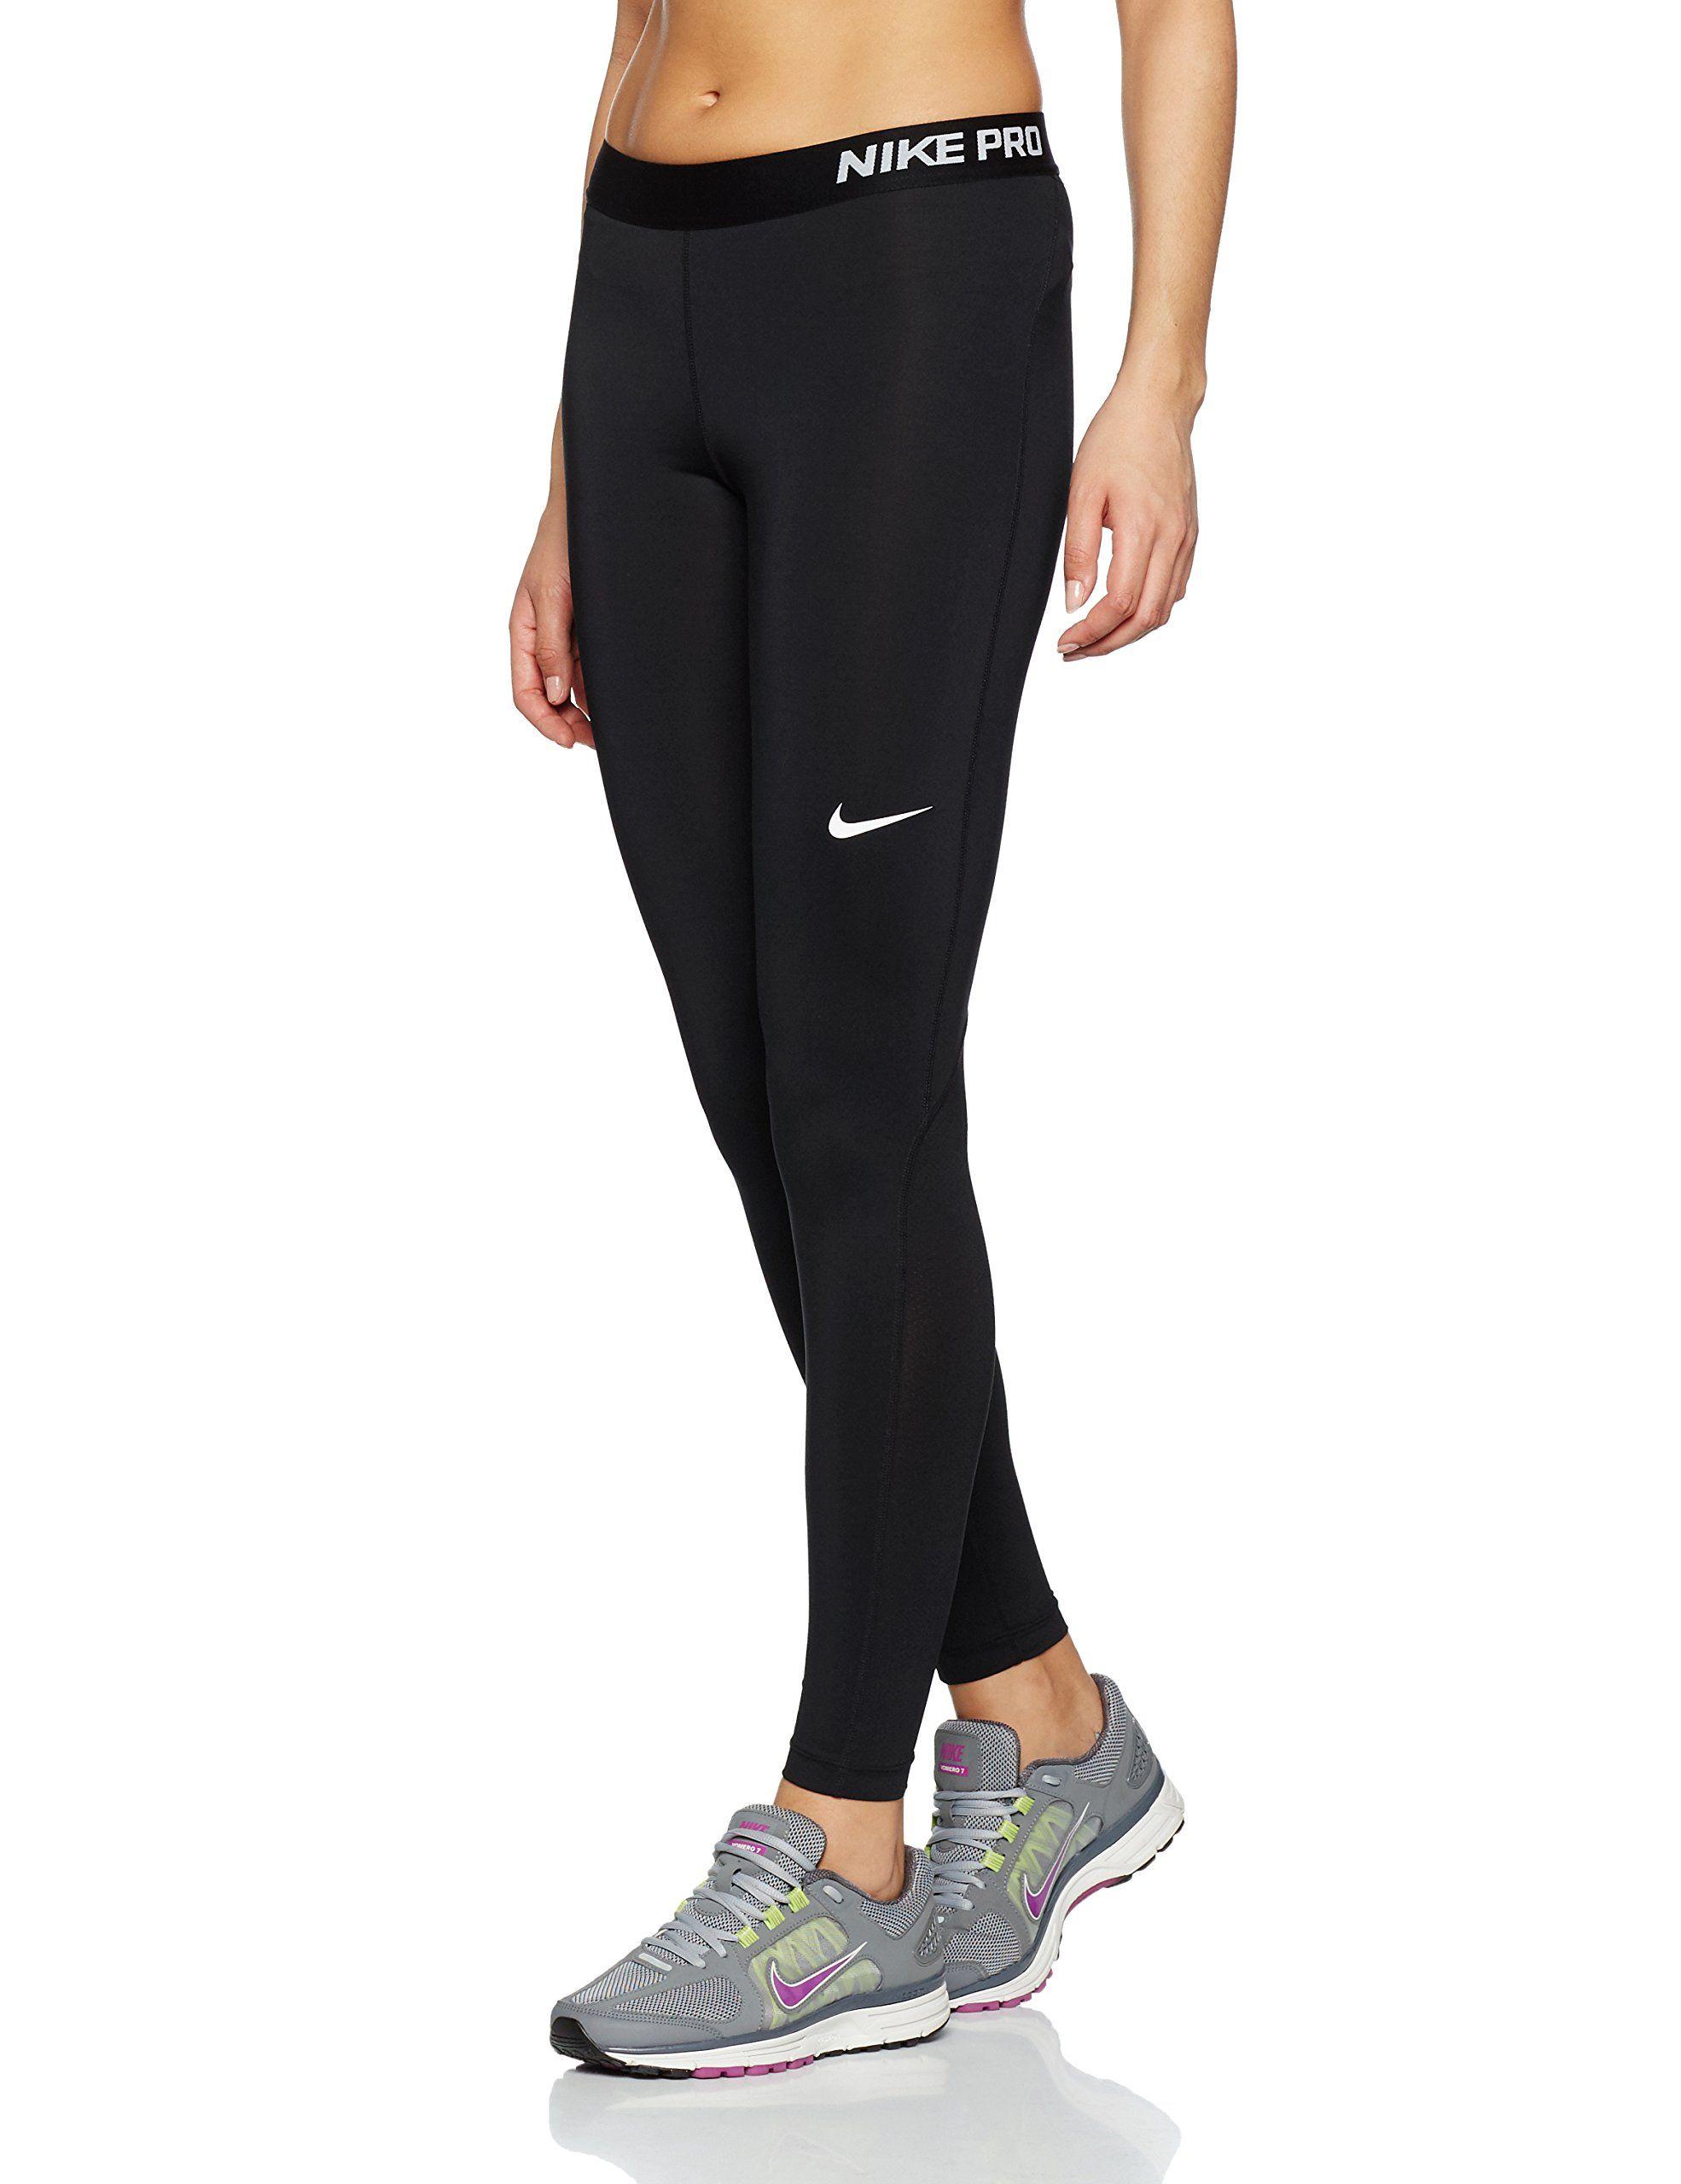 9256d1b436e Nike Pro Women s Training Tights at Amazon Women s Clothing store ...